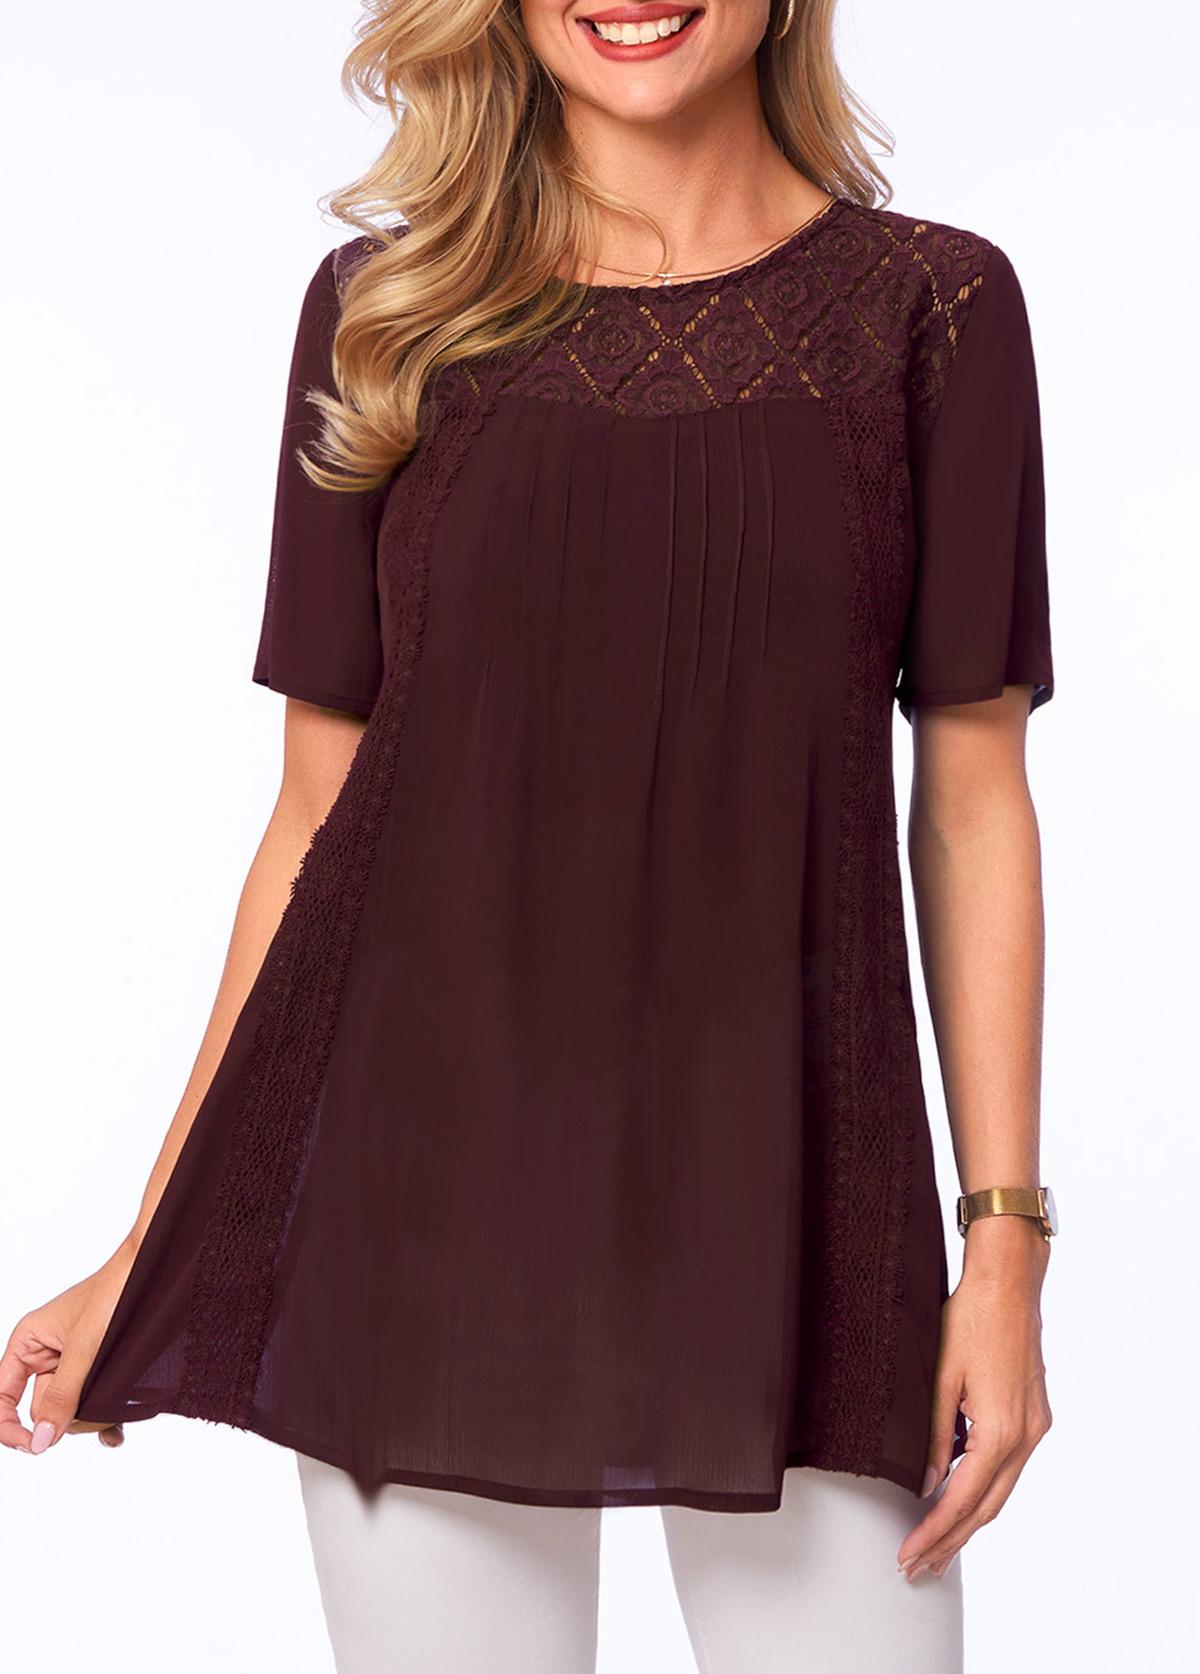 ROTITA Round Neck Lace Stitching Short Sleeve T Shirt